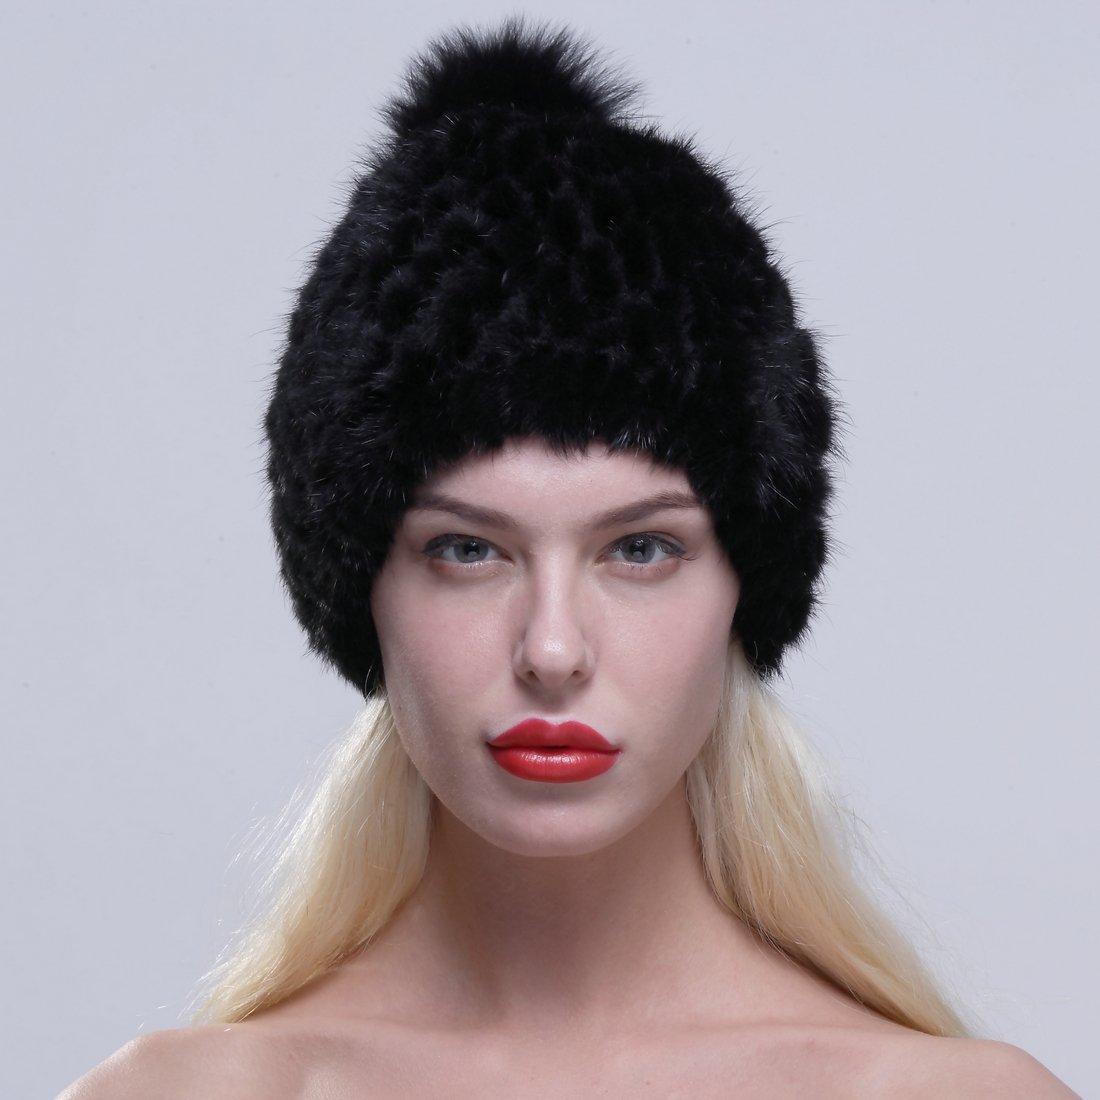 2820623b03cfc URSFUR Women Winter Hat Knit Mink Fur Beanie Cap with Fox Pom Pom Black at  Amazon Women s Clothing store